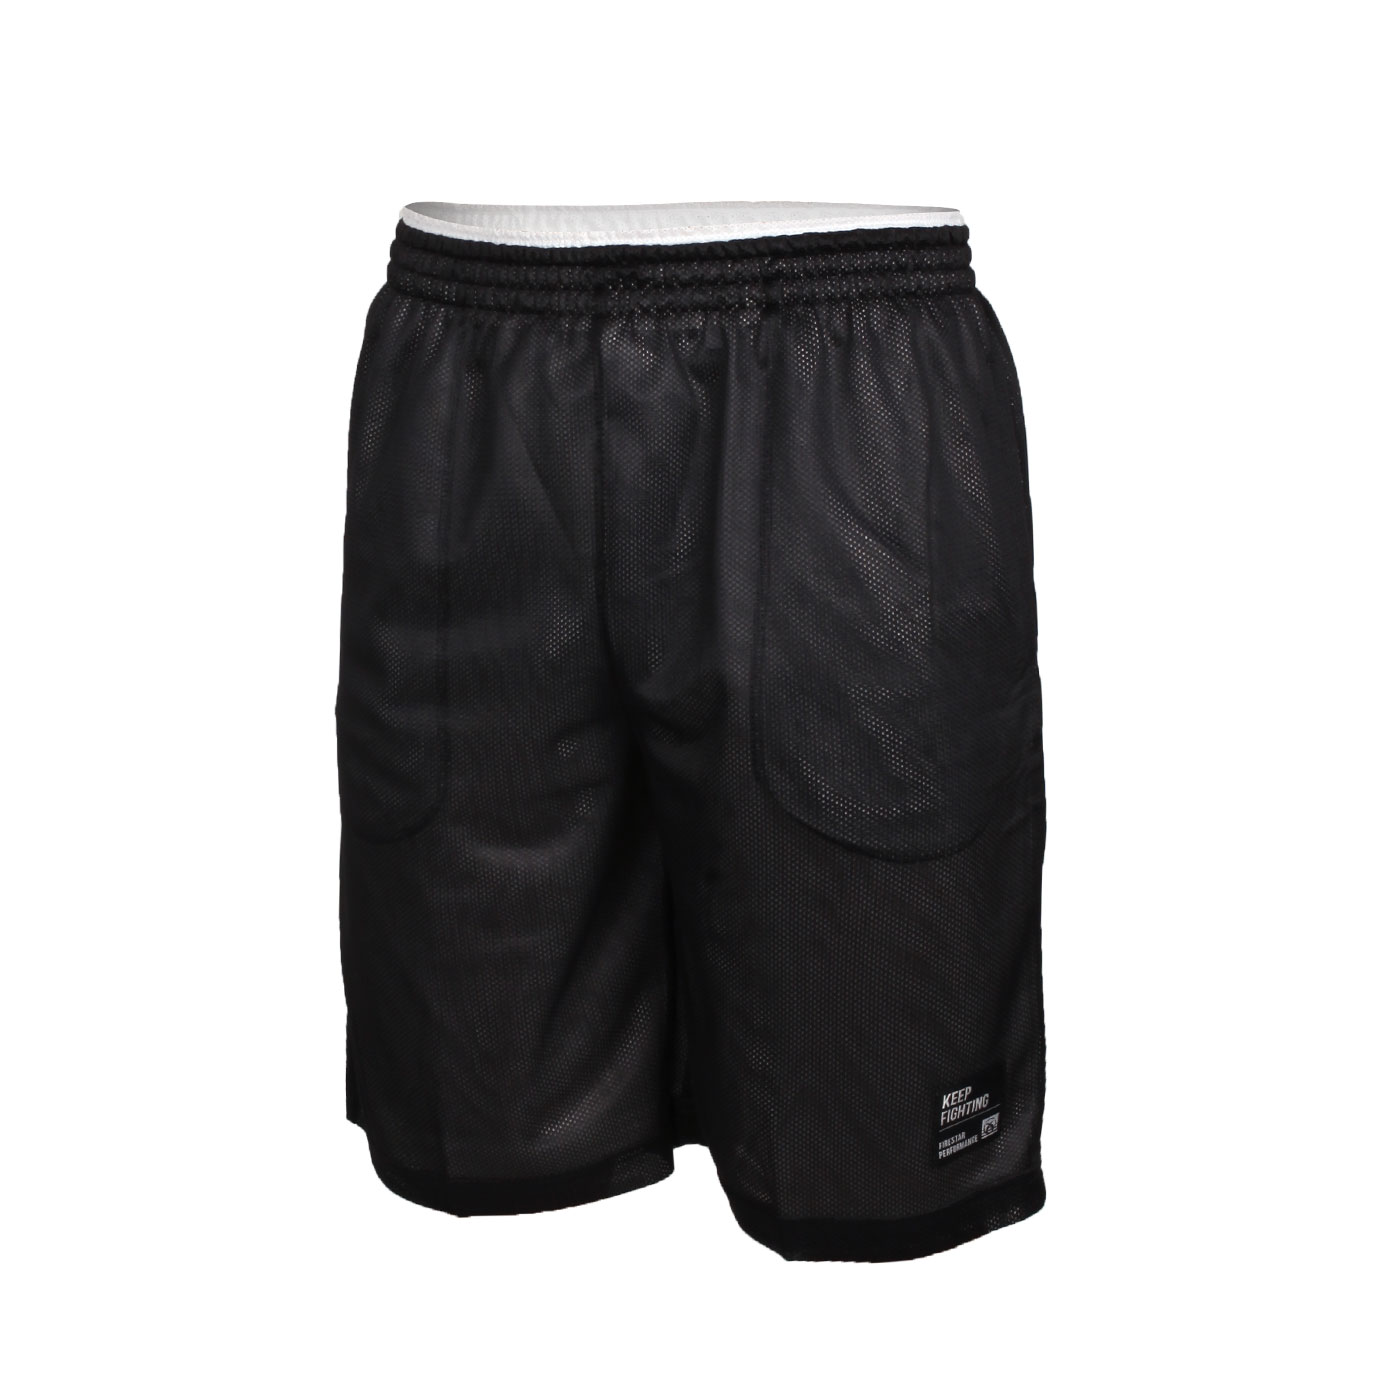 FIRESTAR 男款雙面訓練籃球短褲 B1706-15